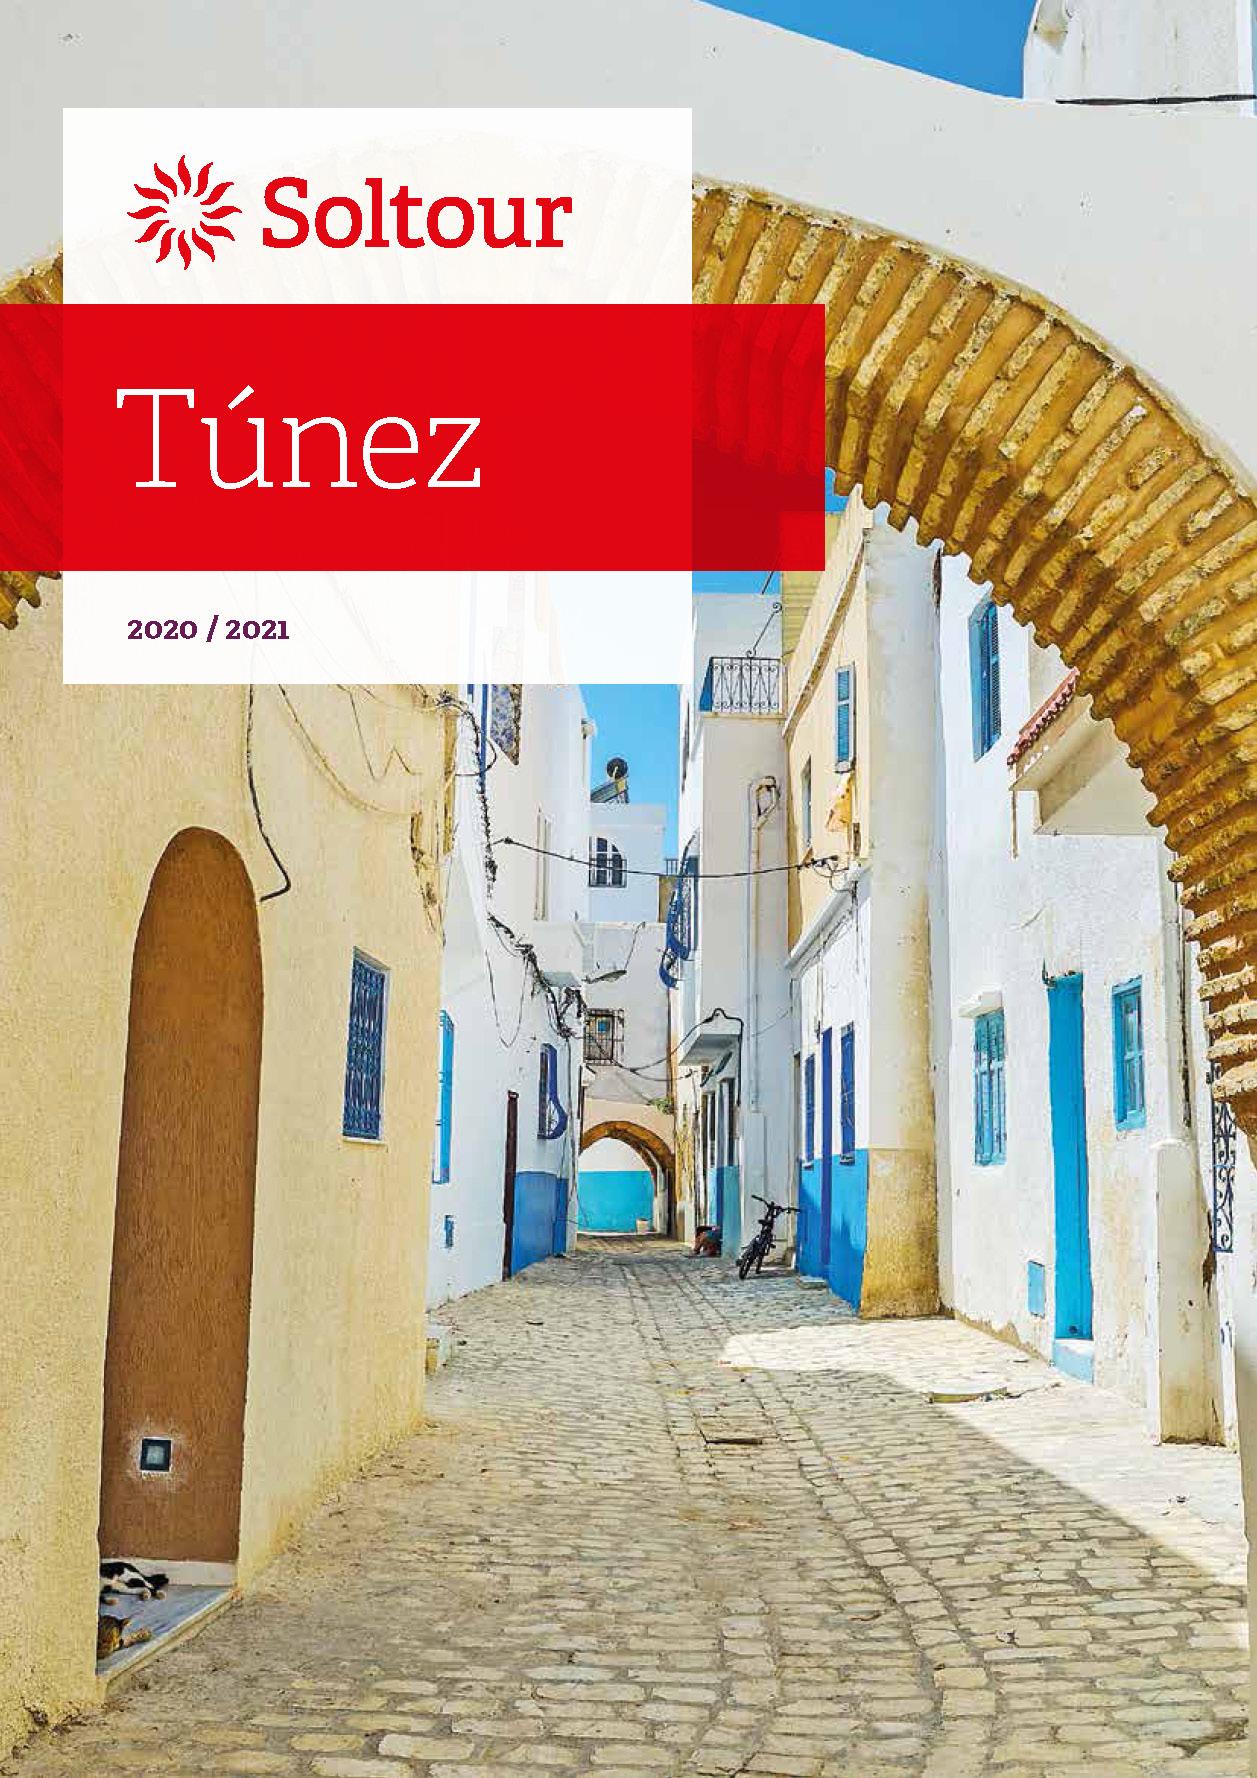 Catalogo Soltour Tunez 2020-2021